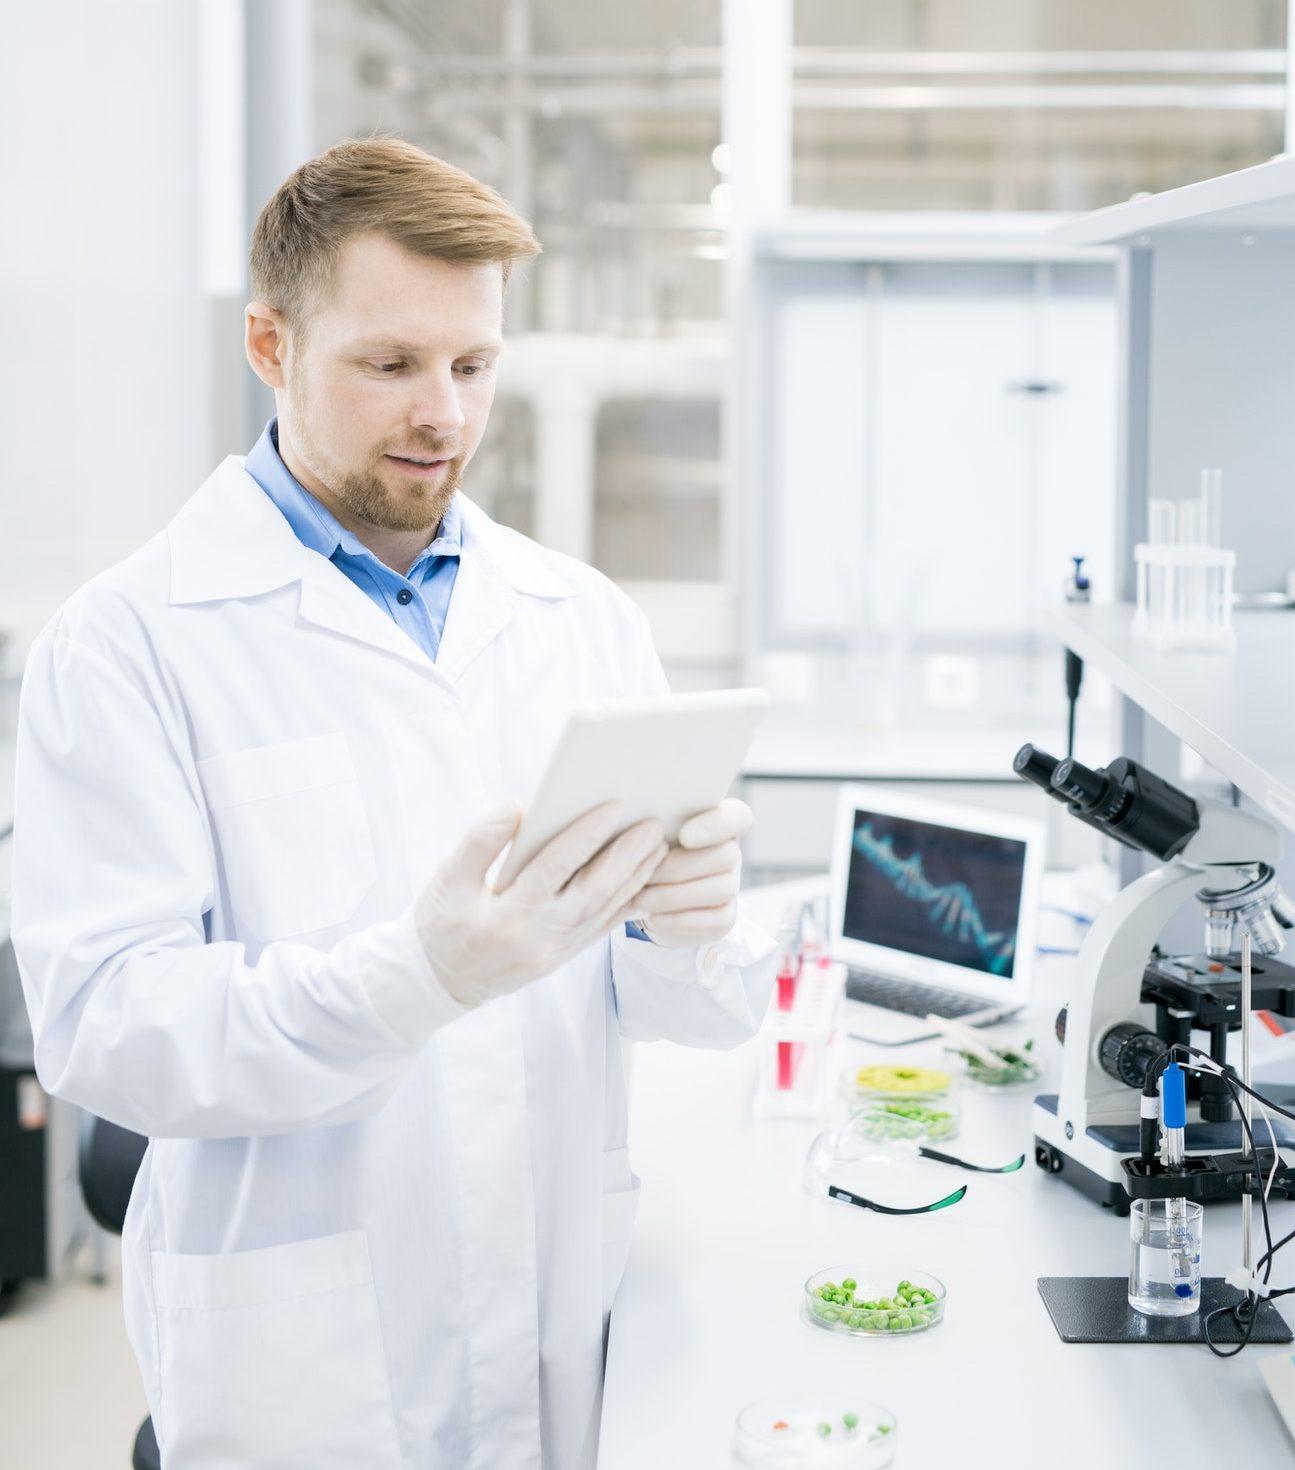 Modern Scientist Using Tablet in Laboratory